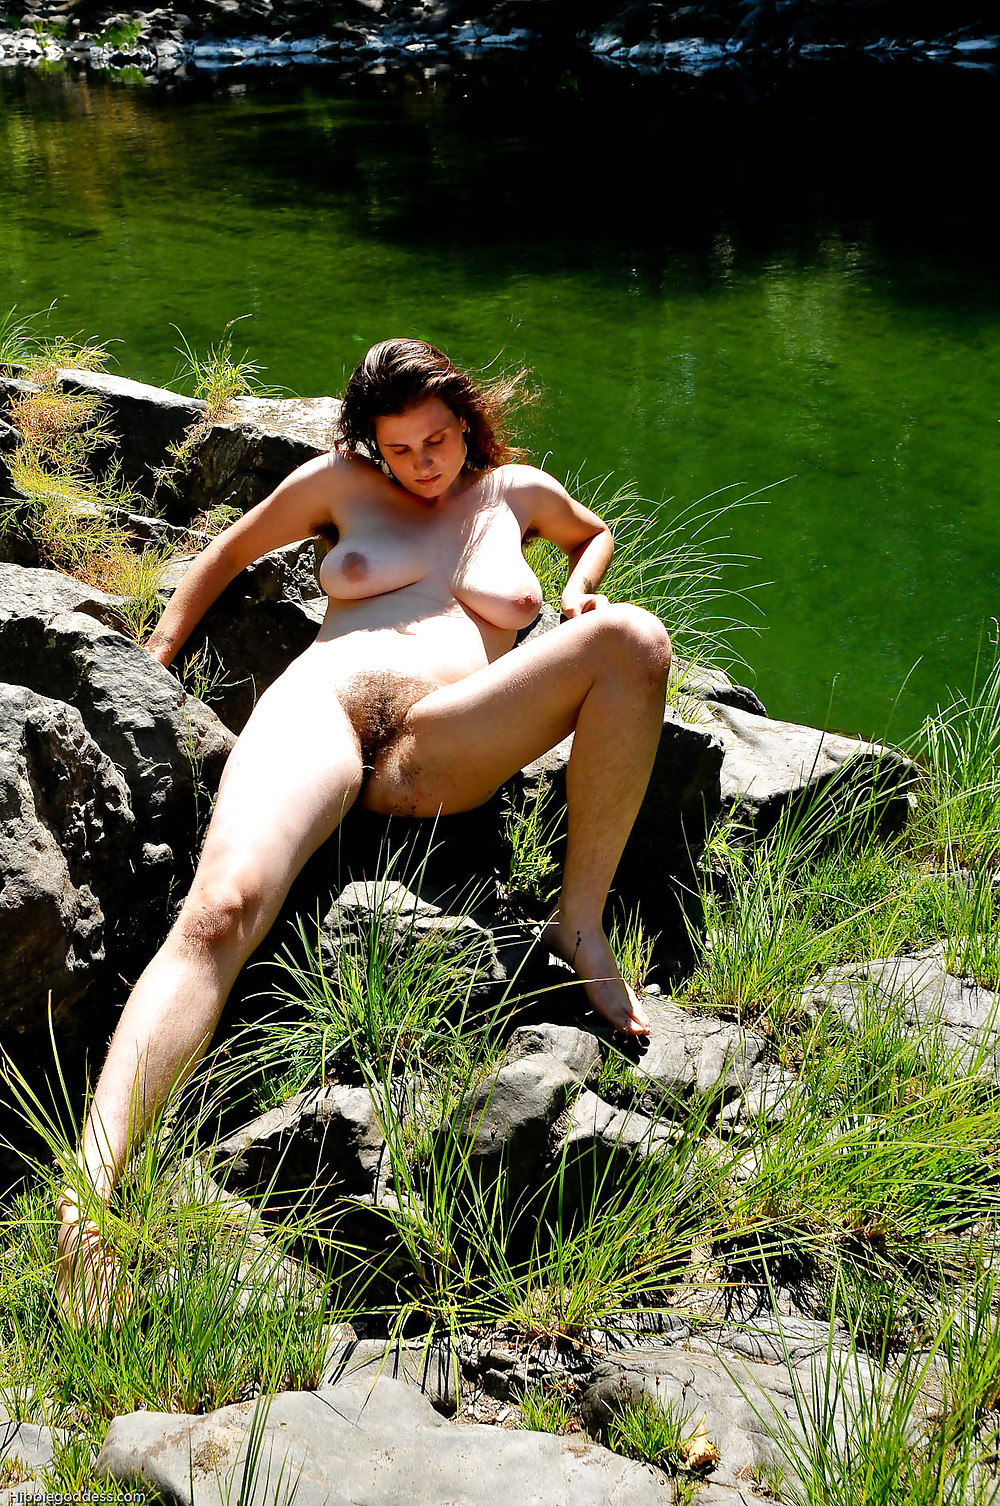 volosatie-devki-na-prirode-porno